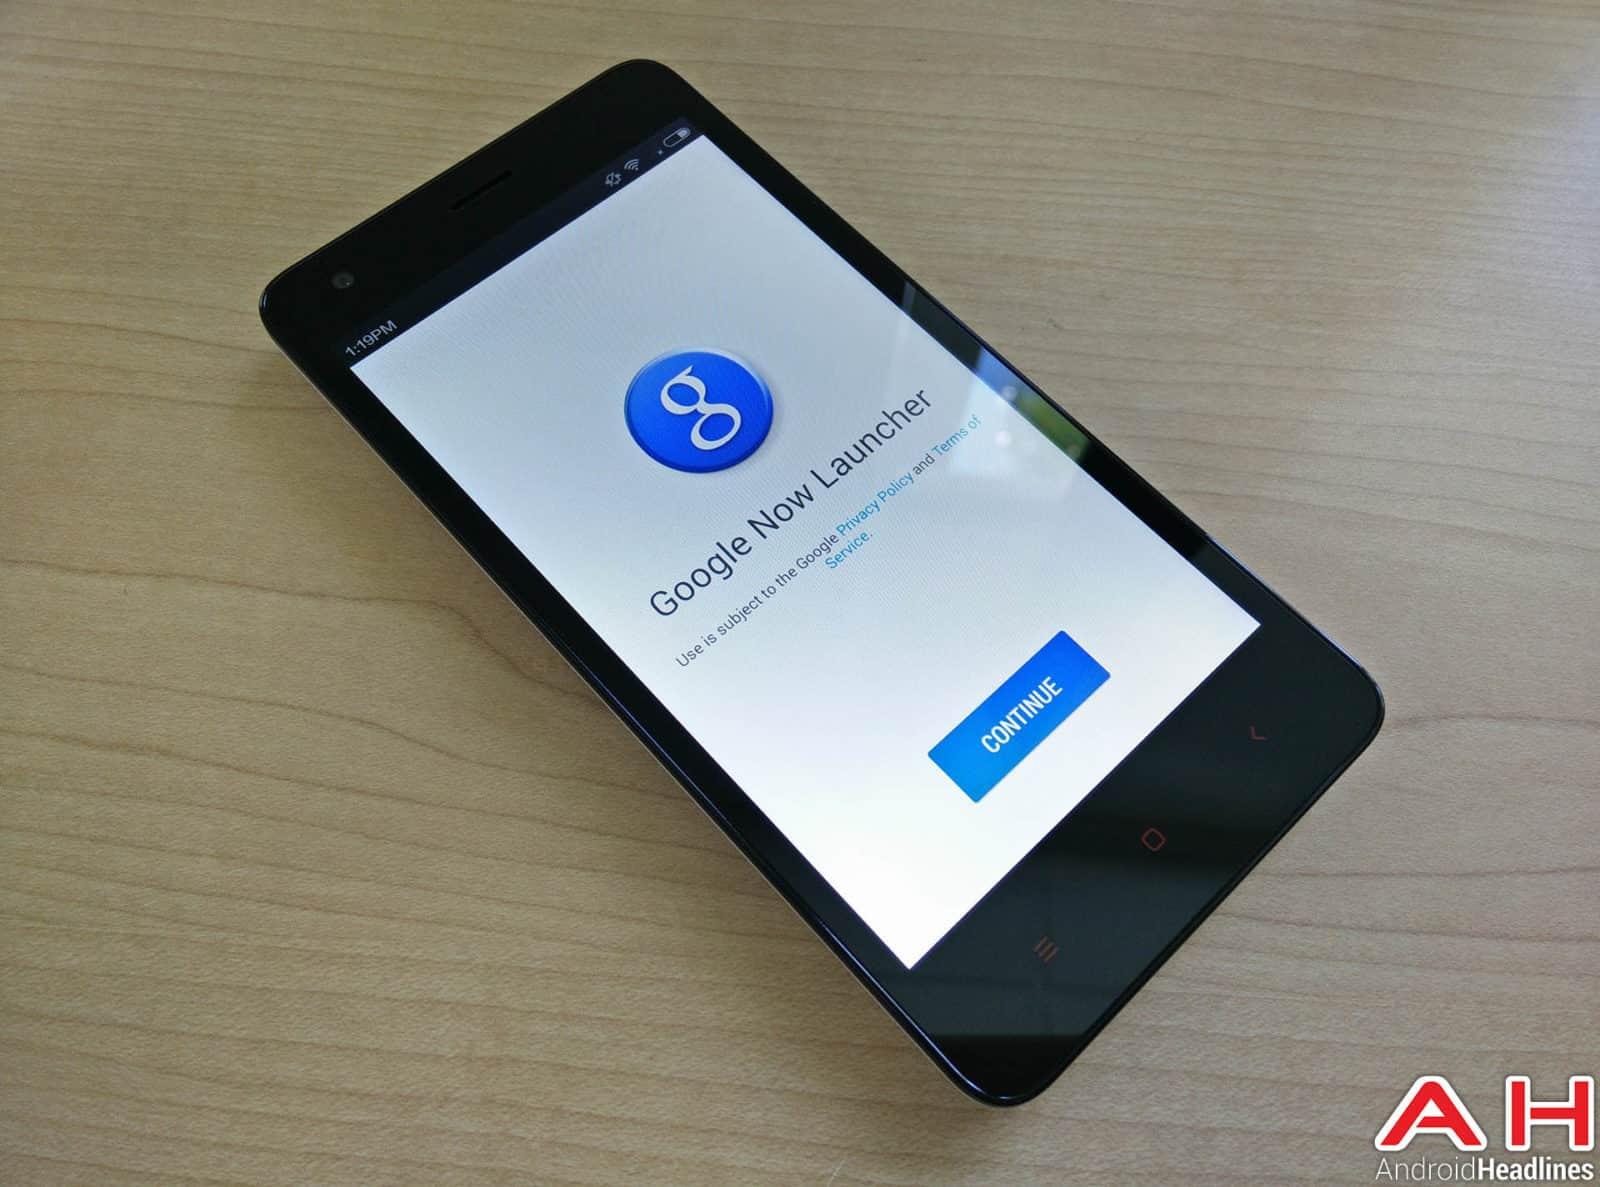 Xiaomi-MIUI-Google-Now-Launcher-1a